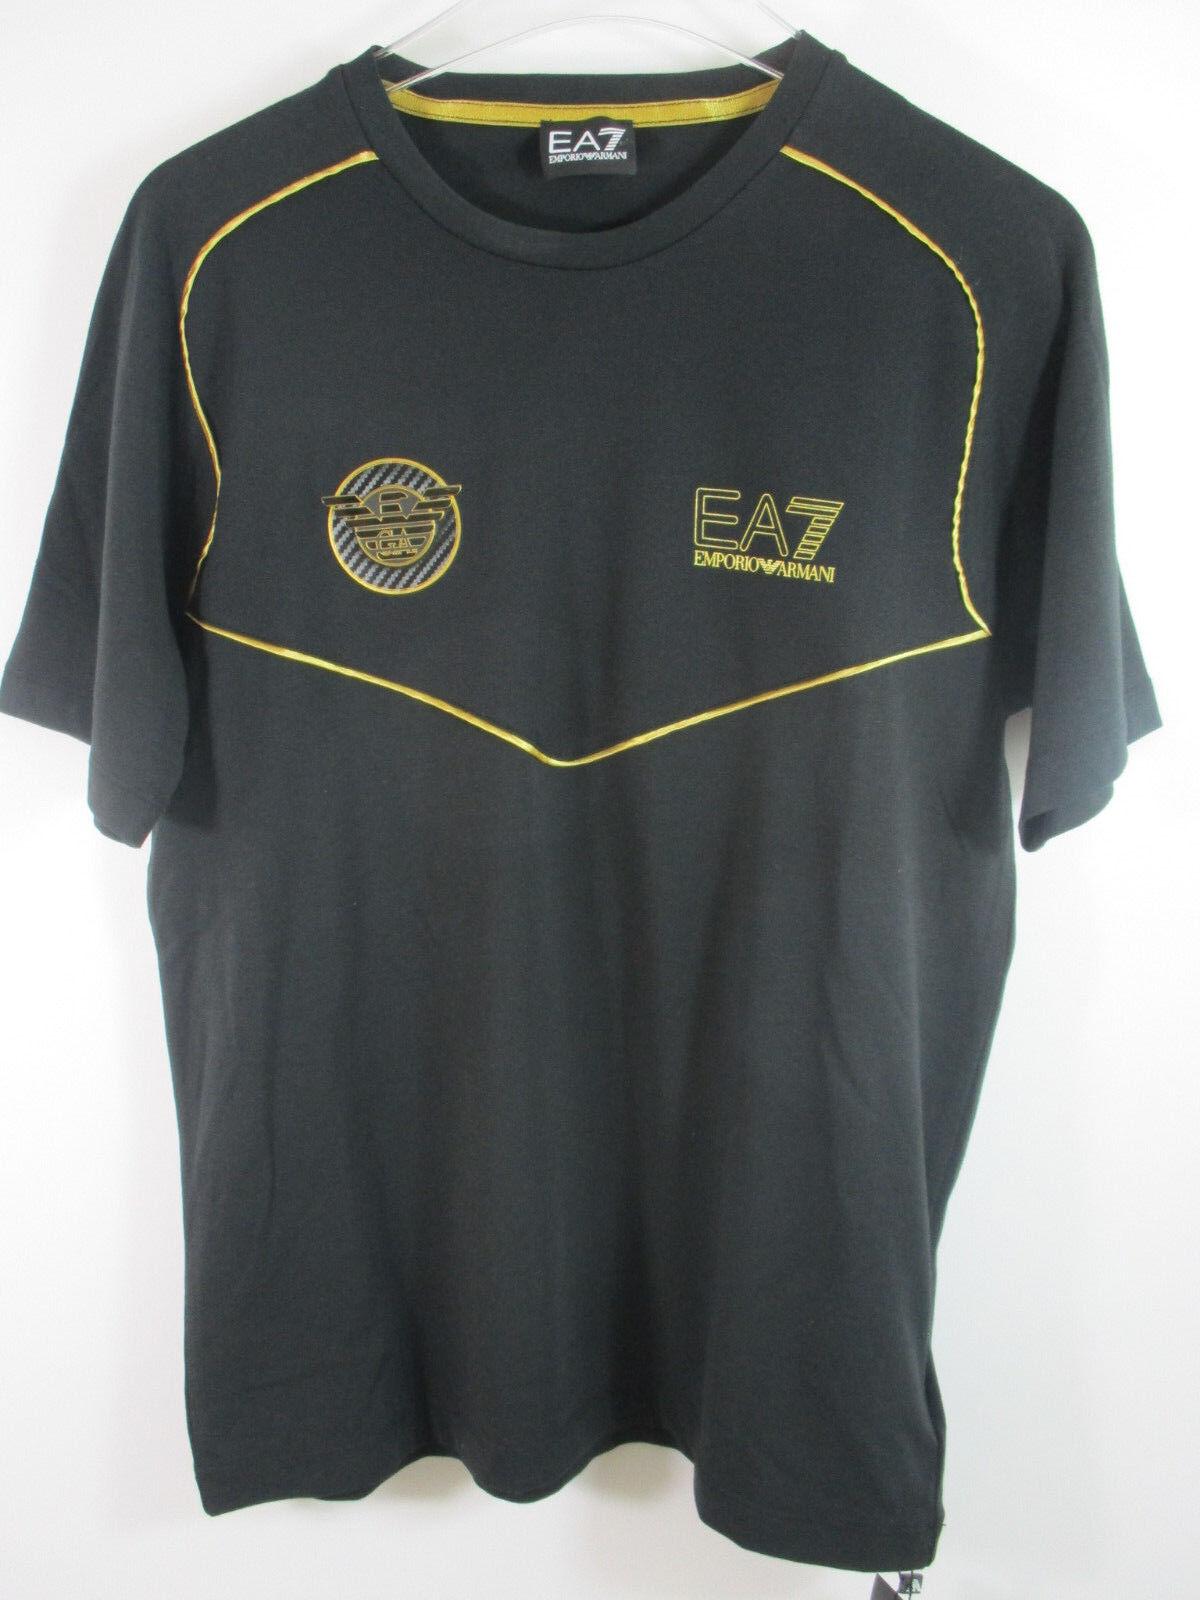 EA7 EMPORIO ARMANI  T - SHIRT SCHWARZ  Grösse : M